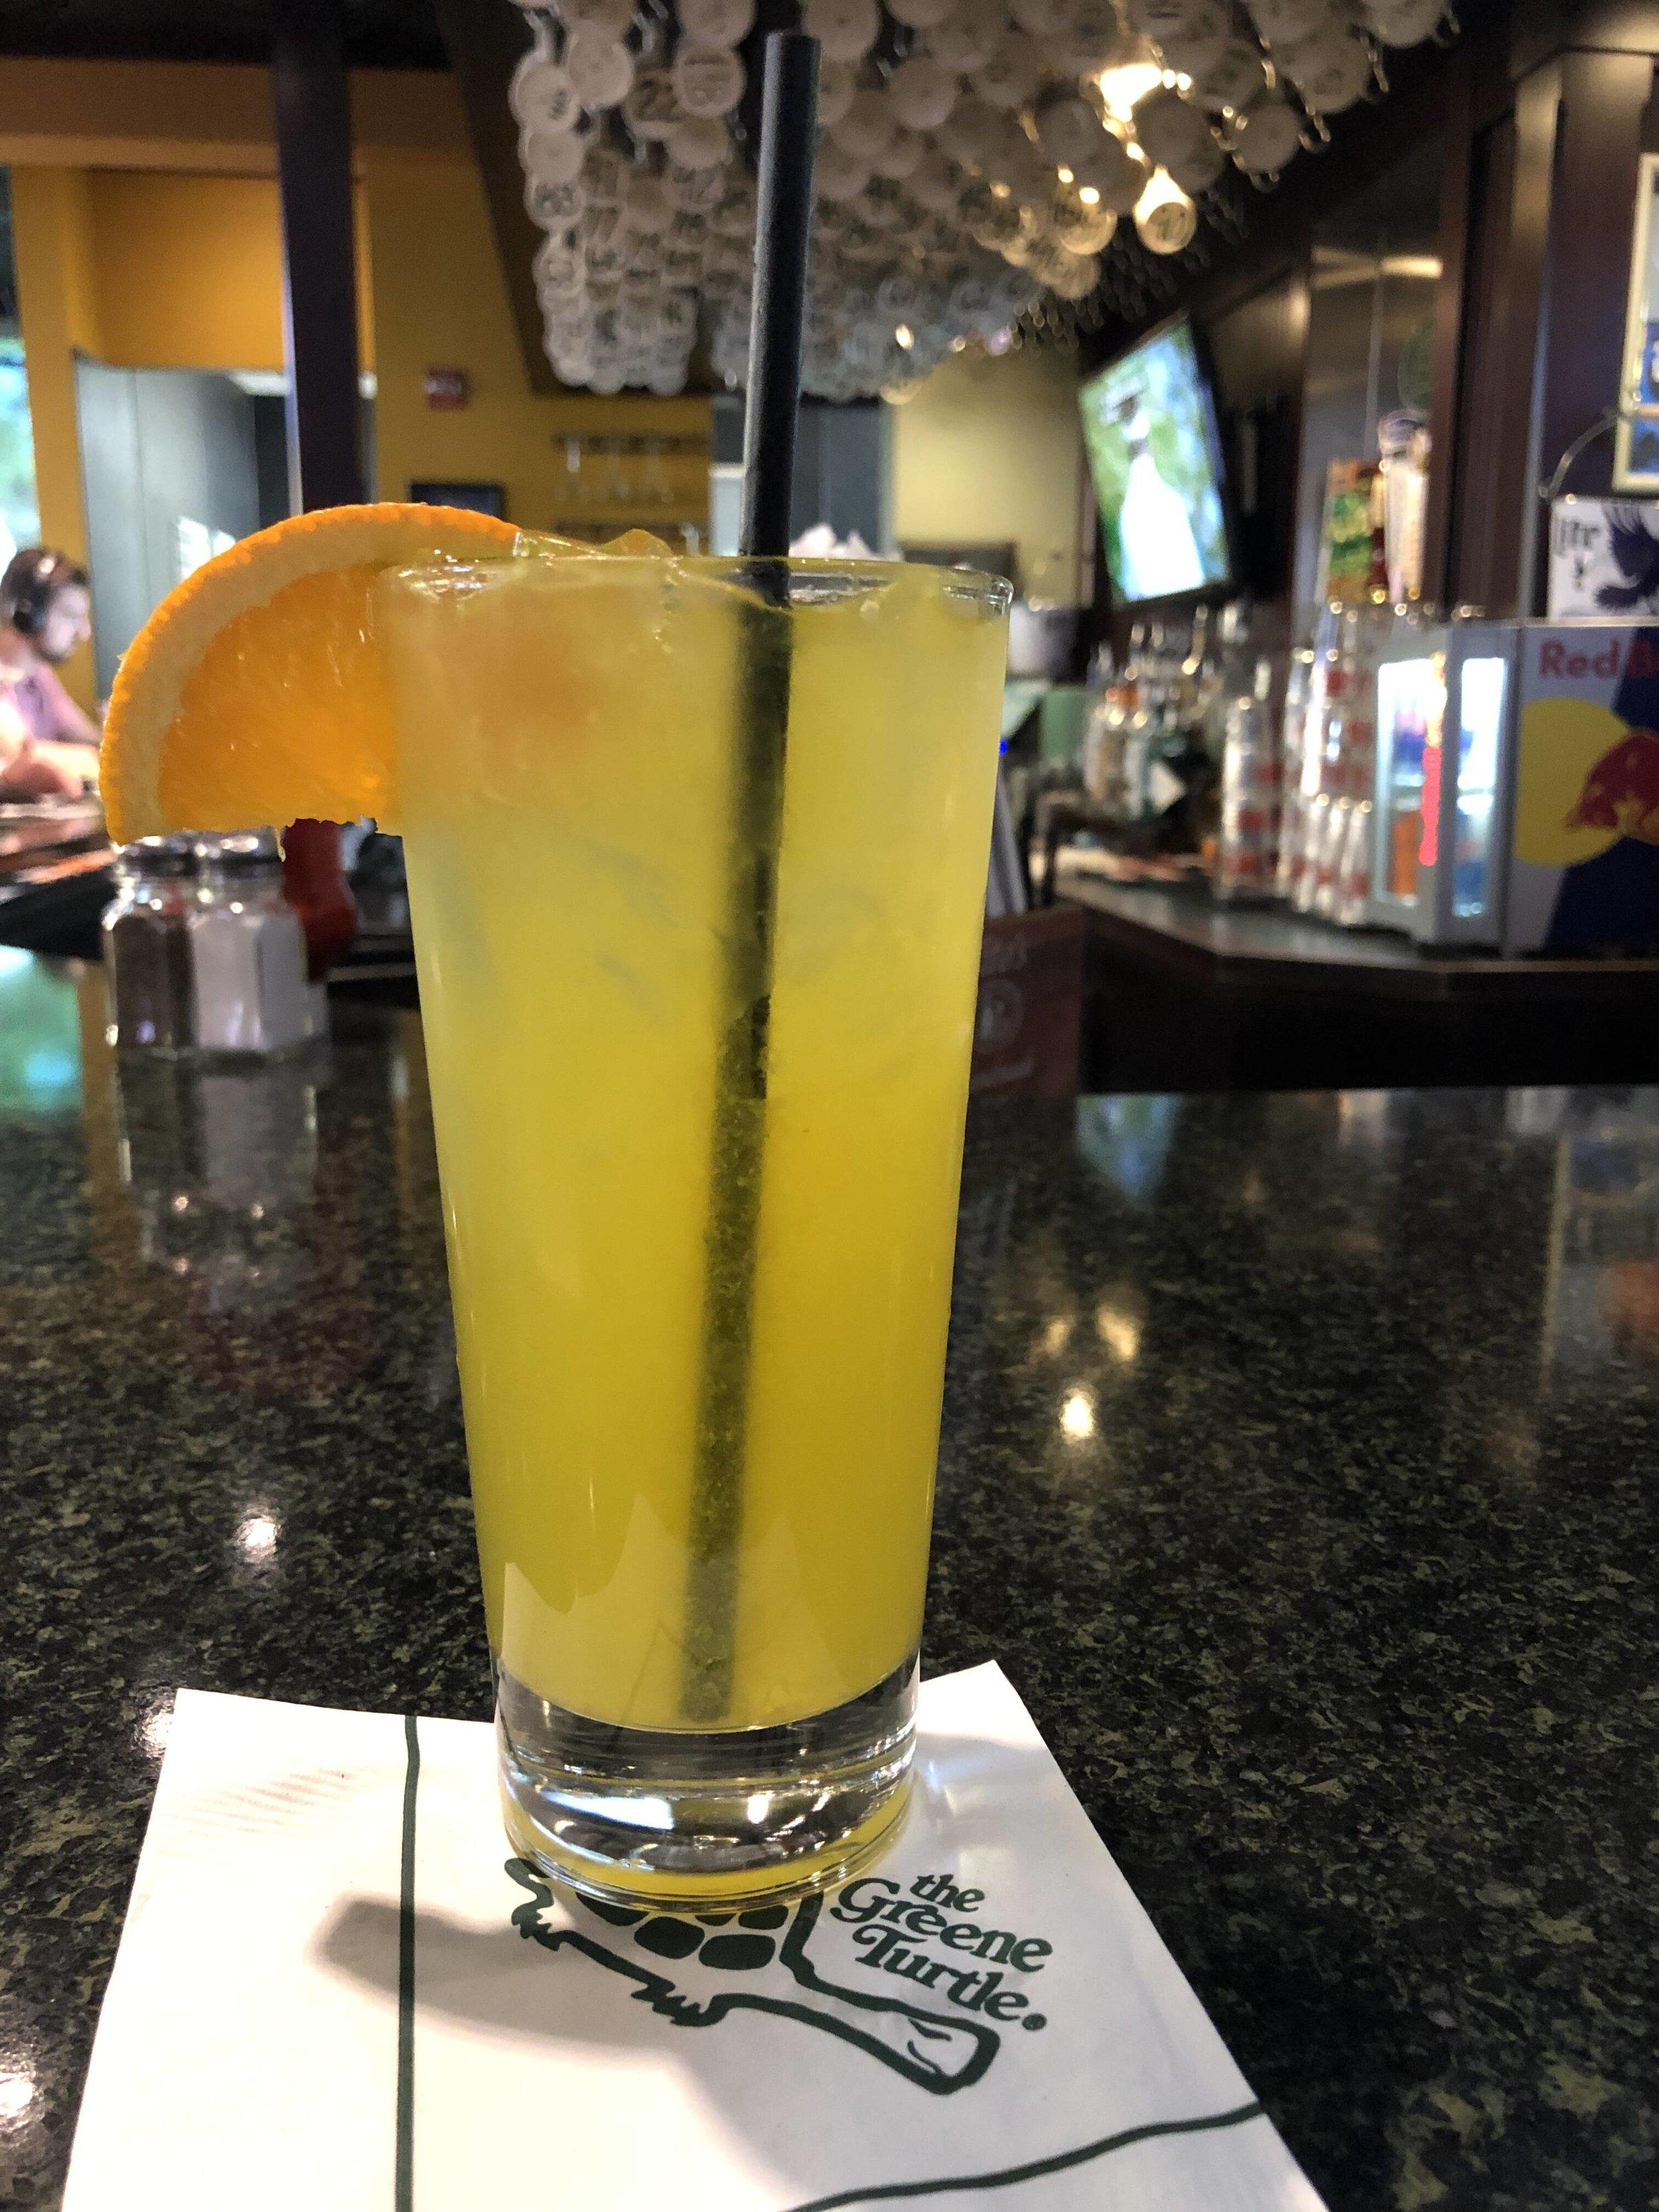 Pre-flight beverage